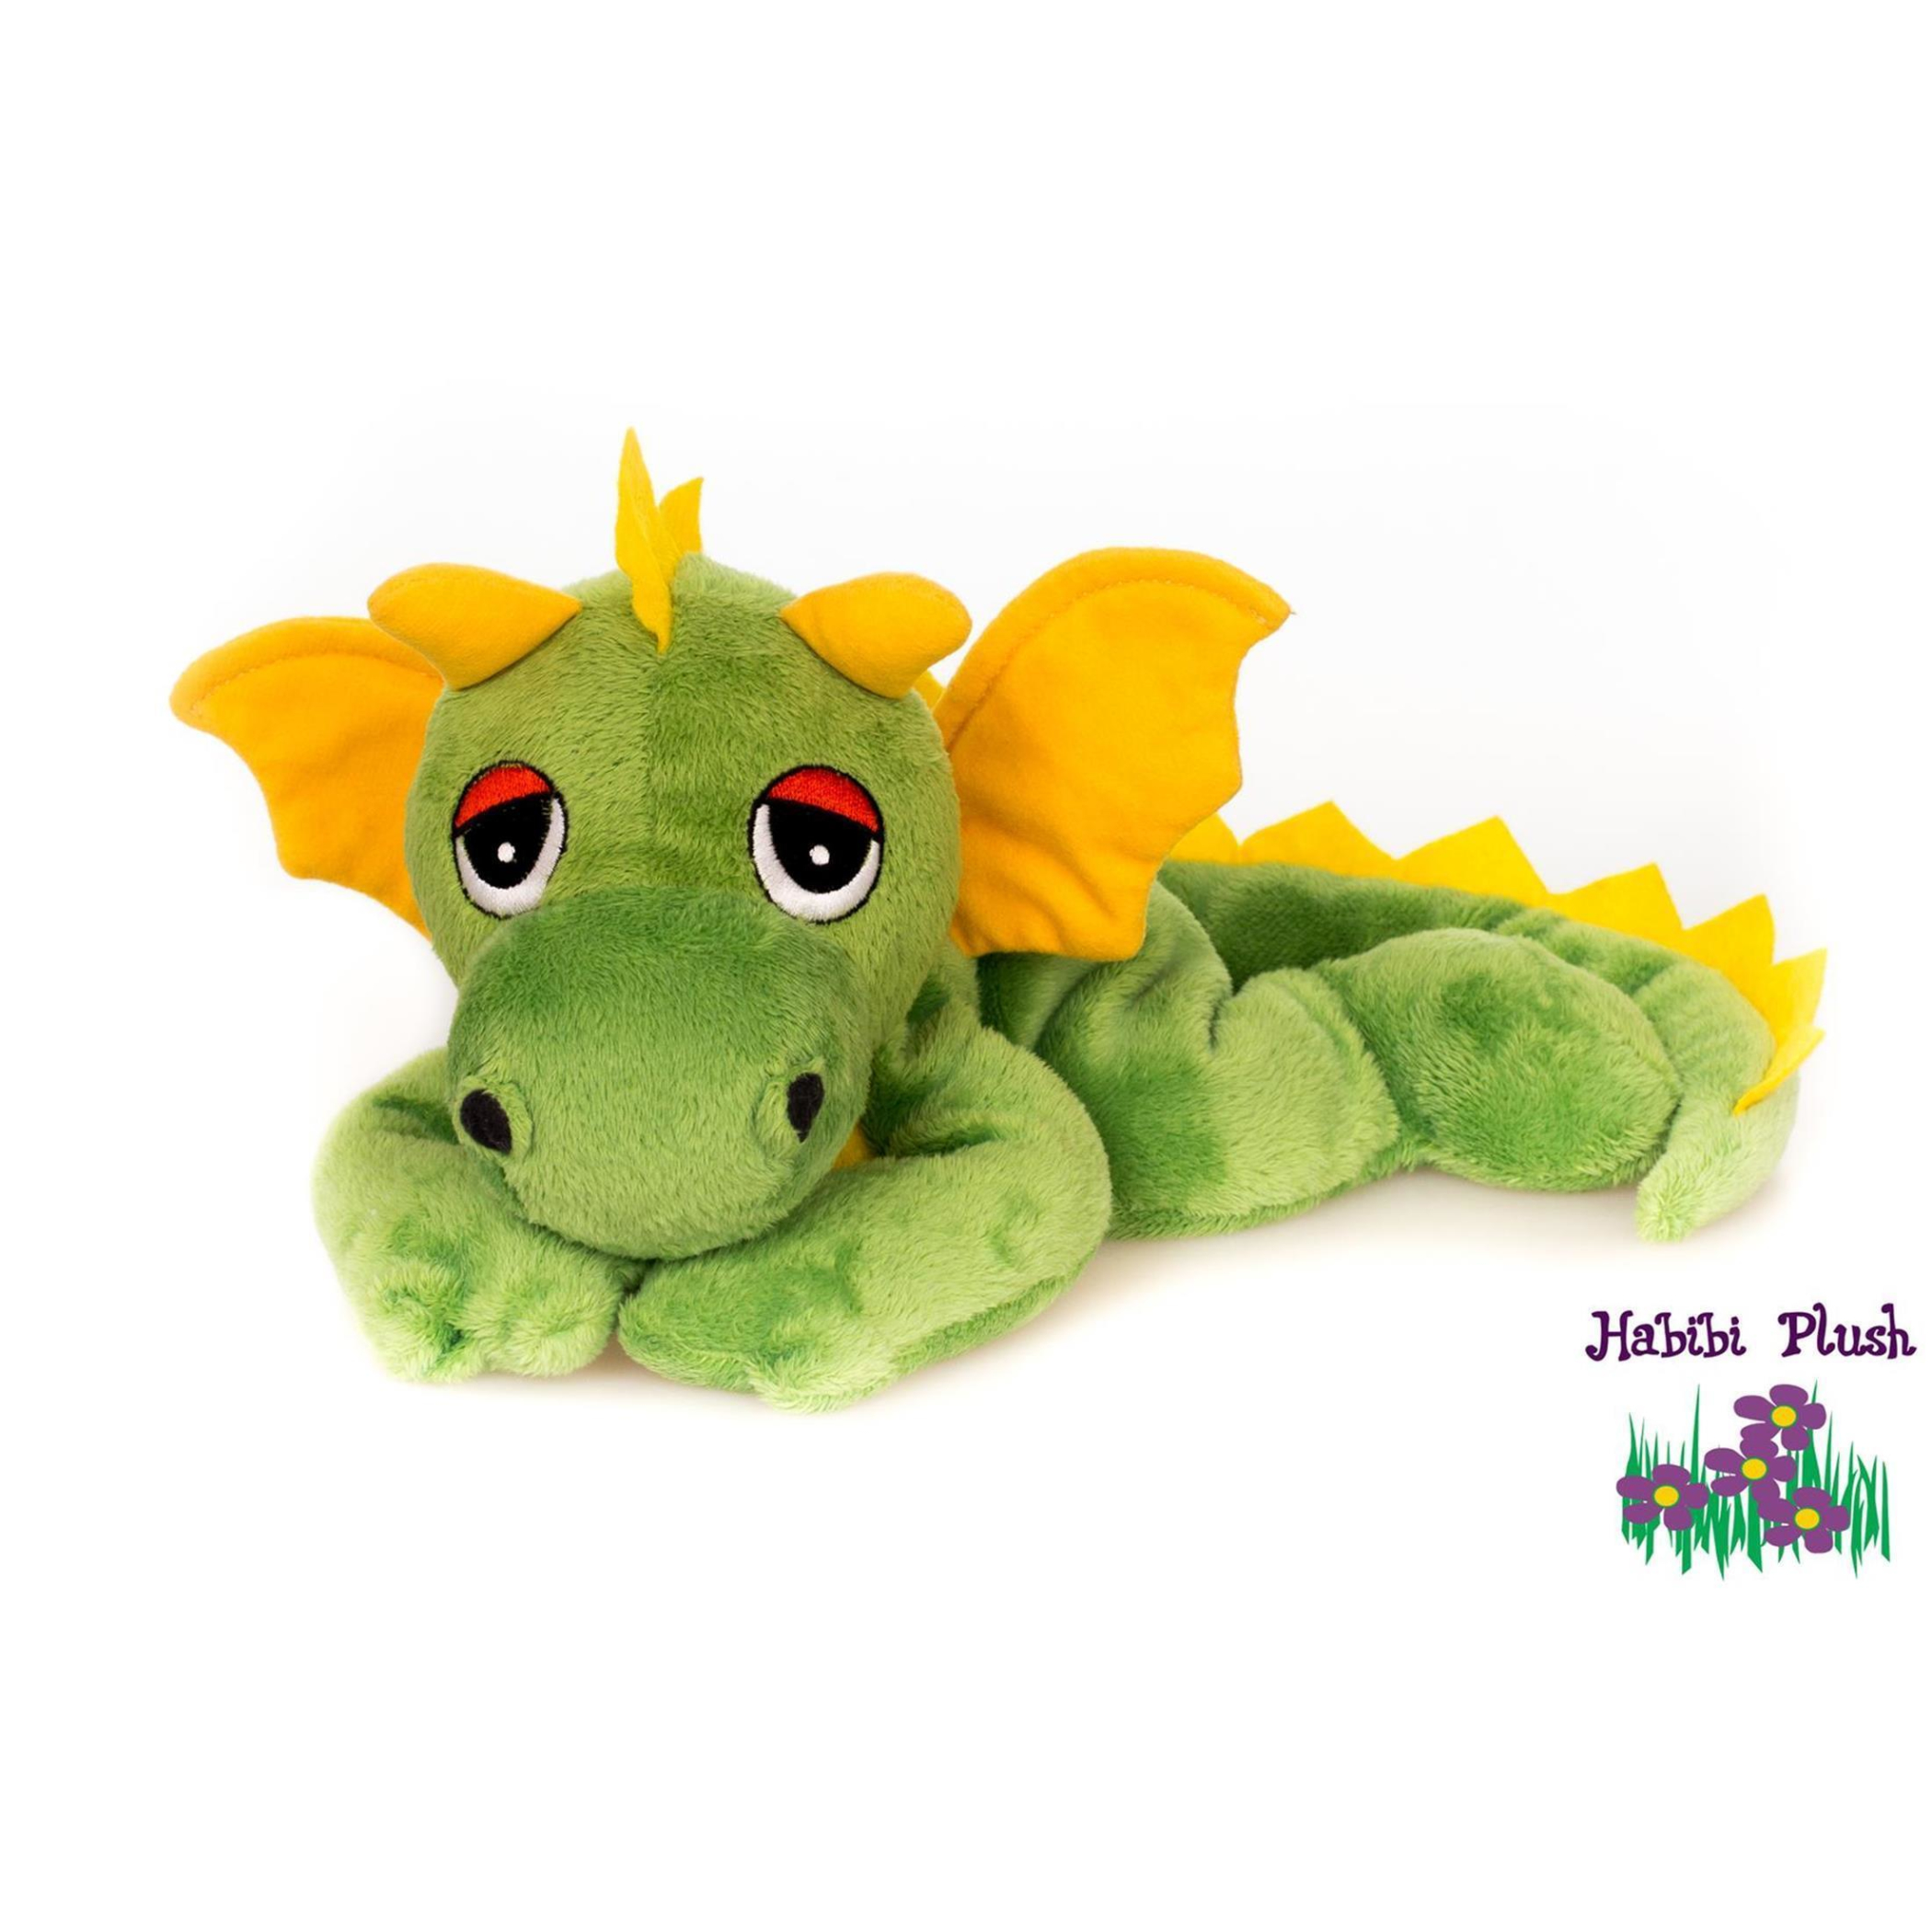 Habibi Plush : Glücksdrache Grün/ Gelb